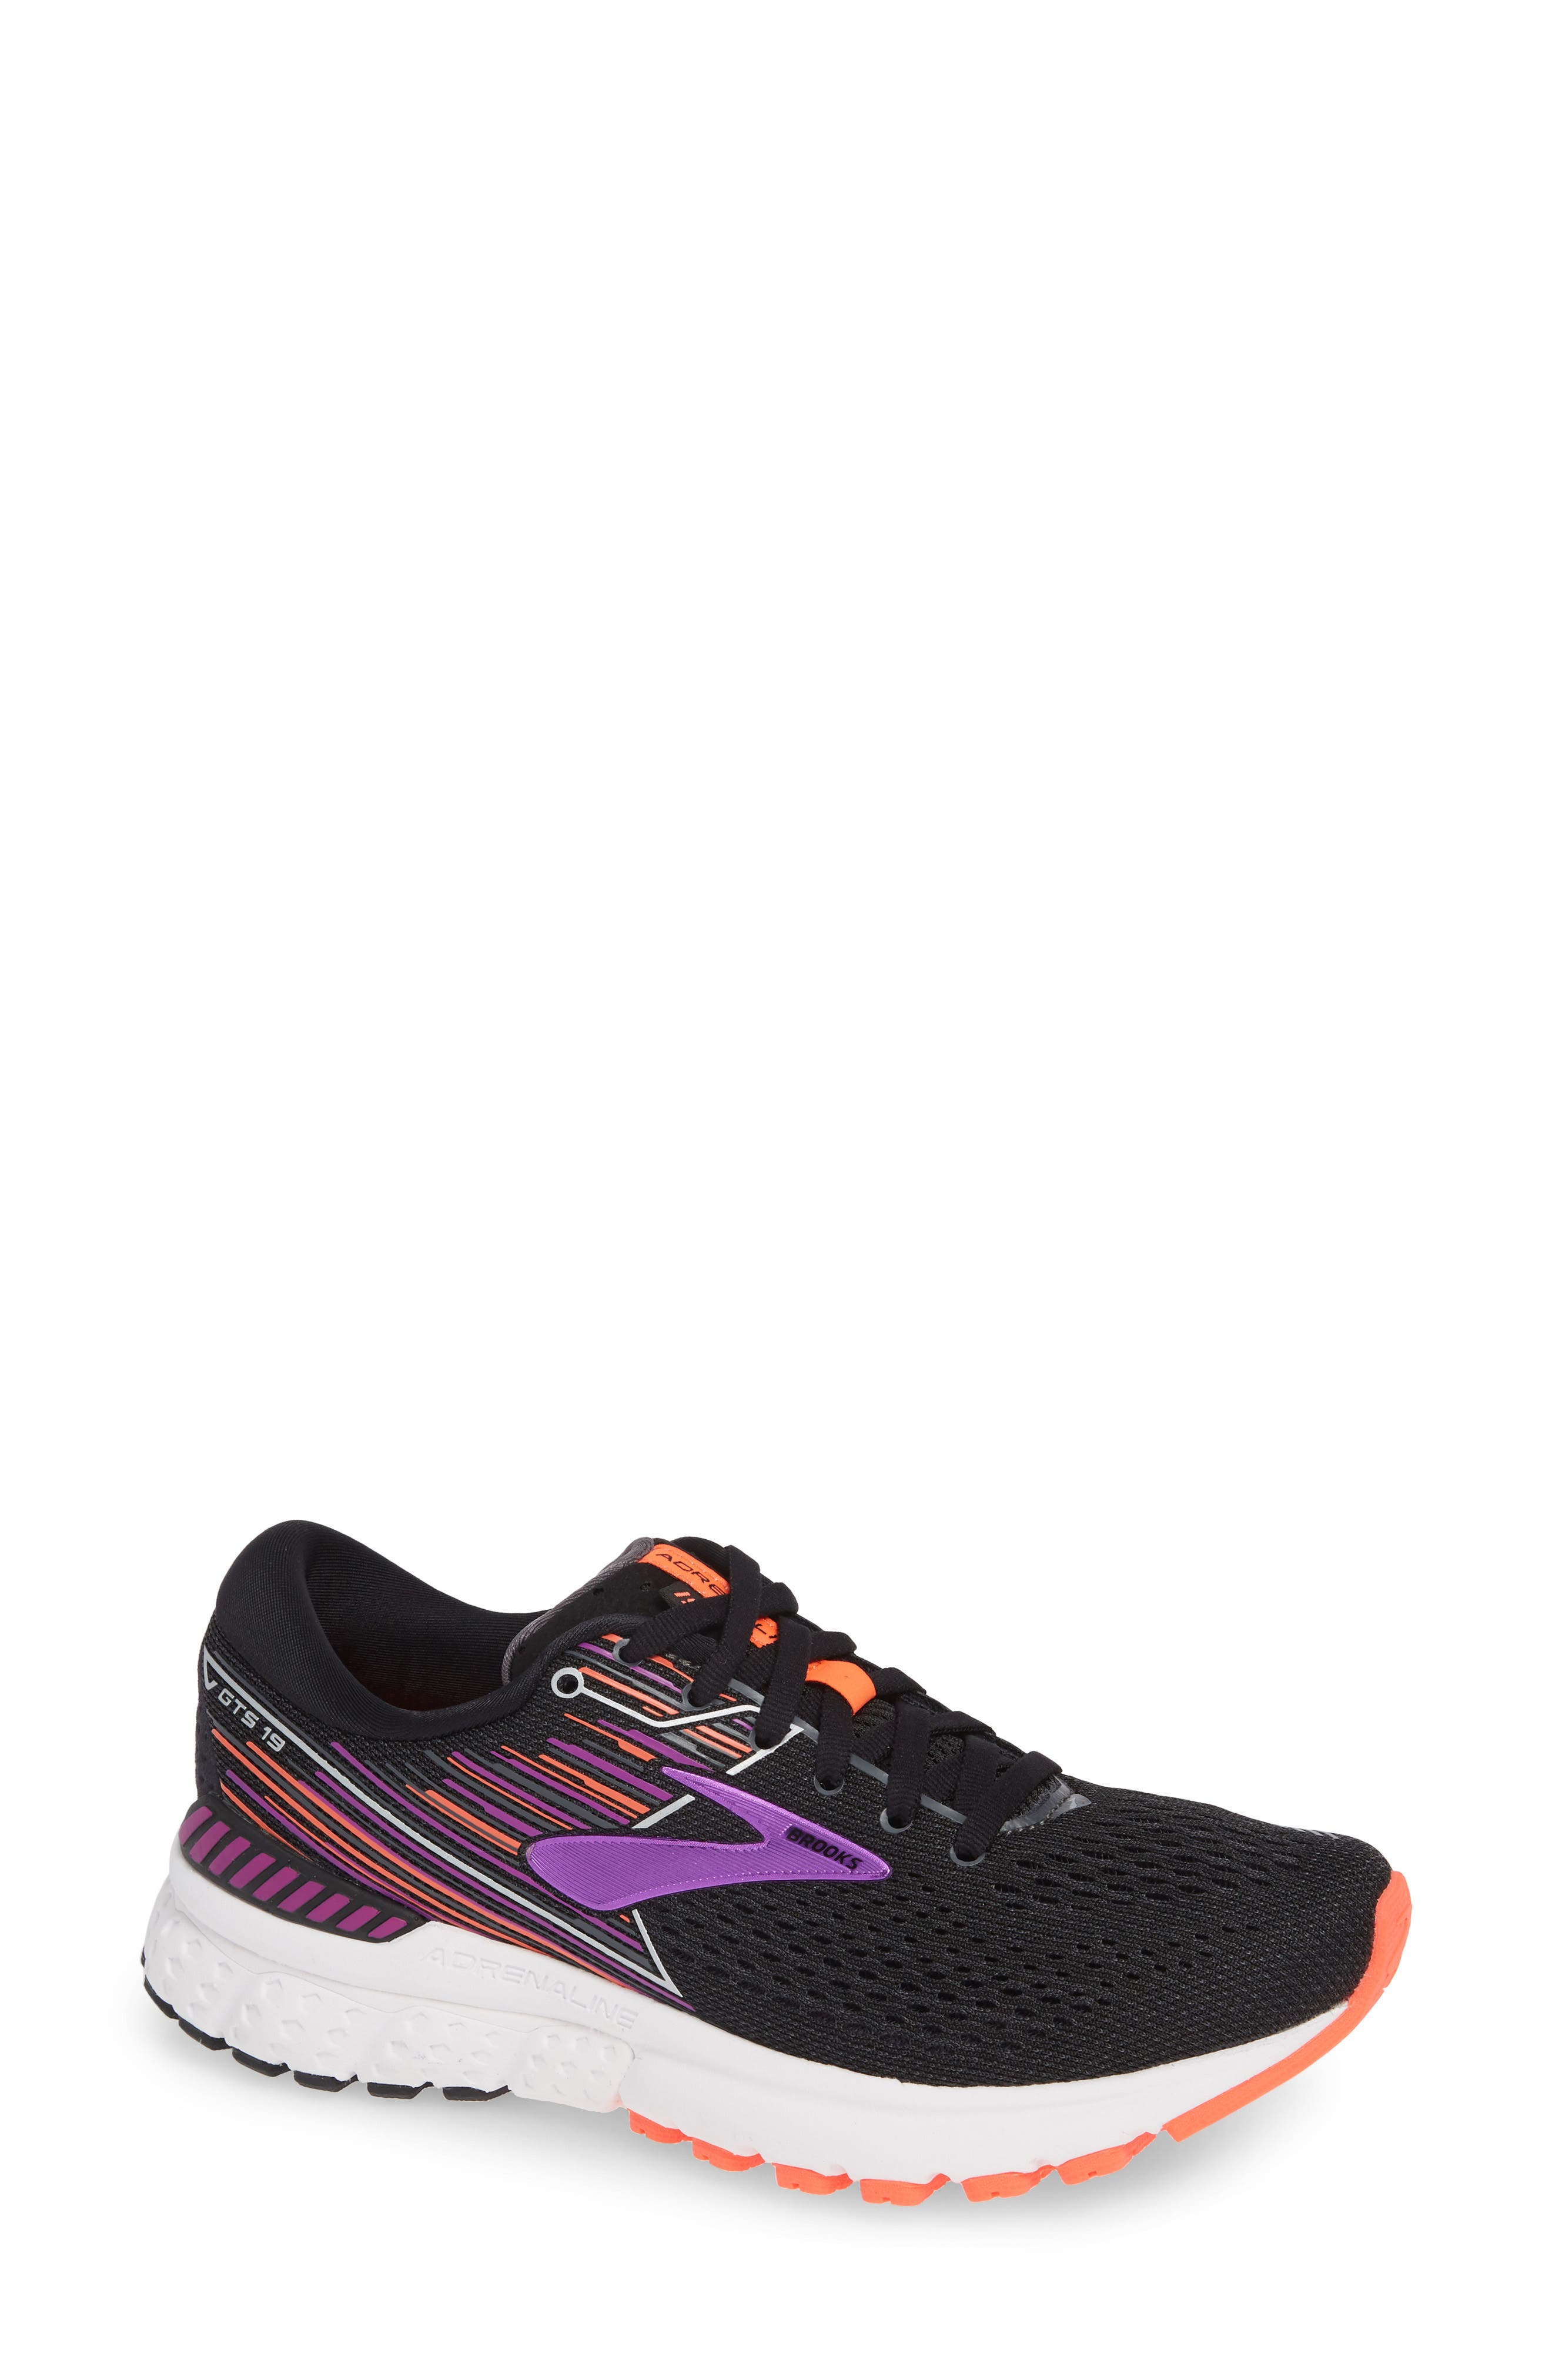 Adrenaline GTS 19 Running Shoe, Main, color, BLACK/ PURPLE/ CORAL